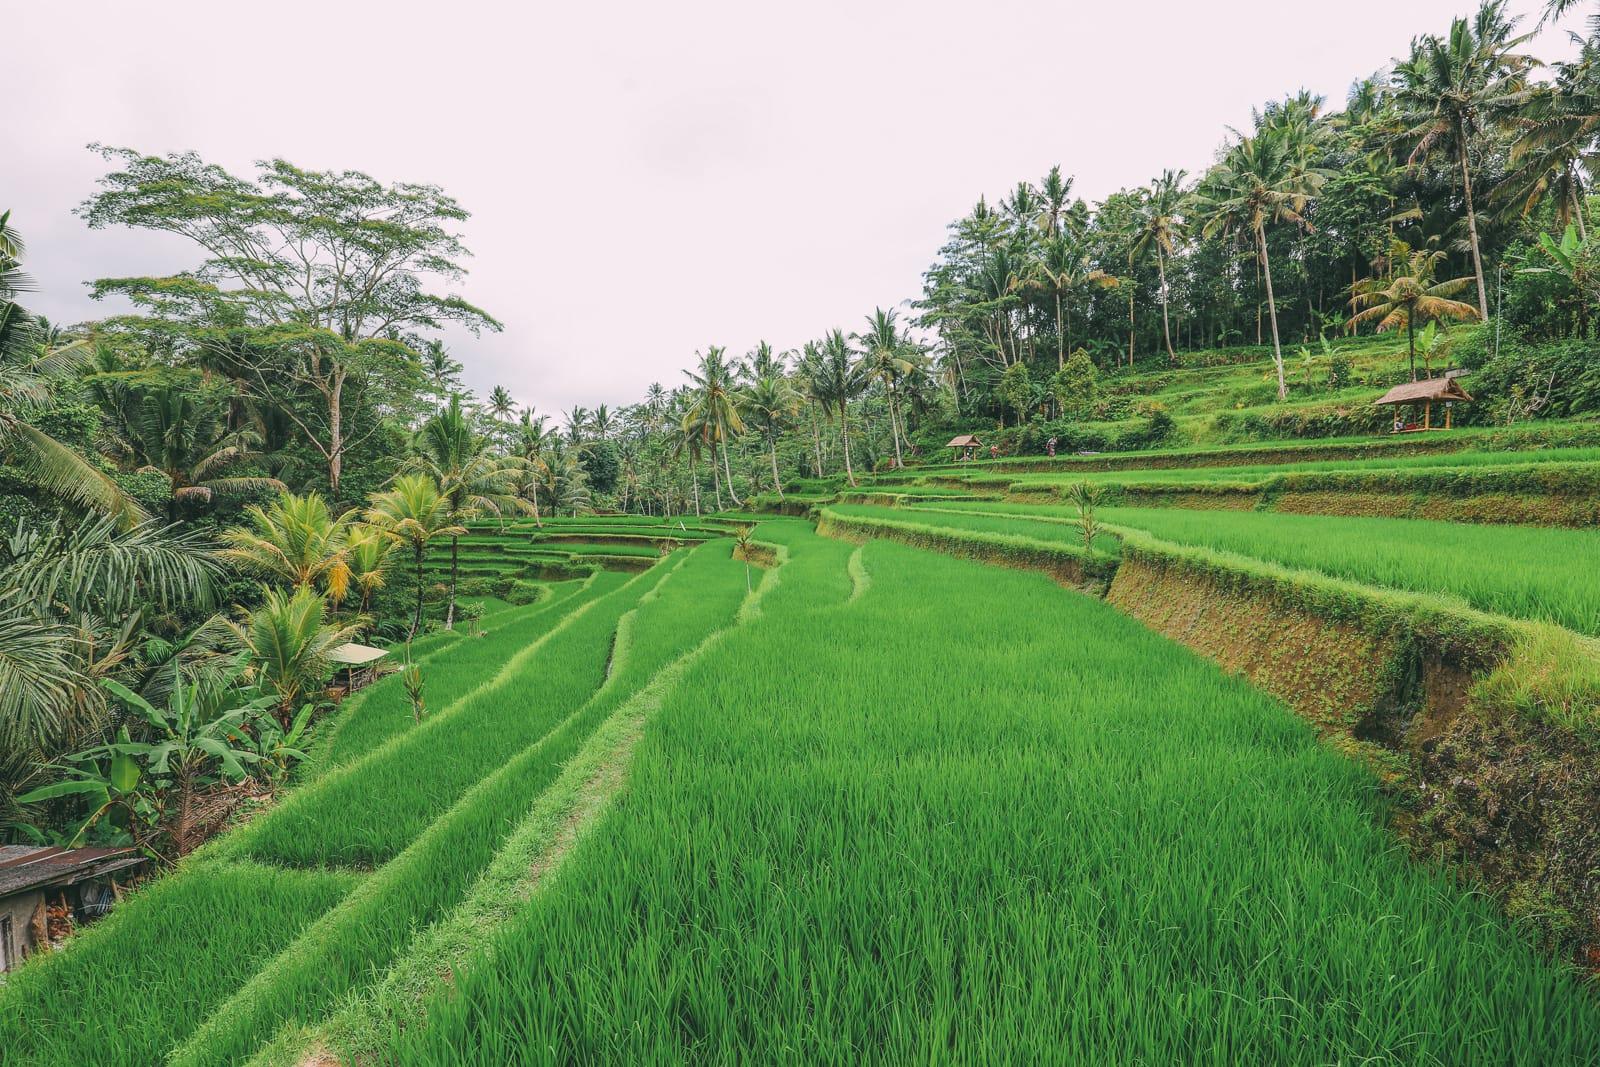 Bali Travel - Tegalalang Rice Terrace In Ubud And Gunung Kawi Temple (45)